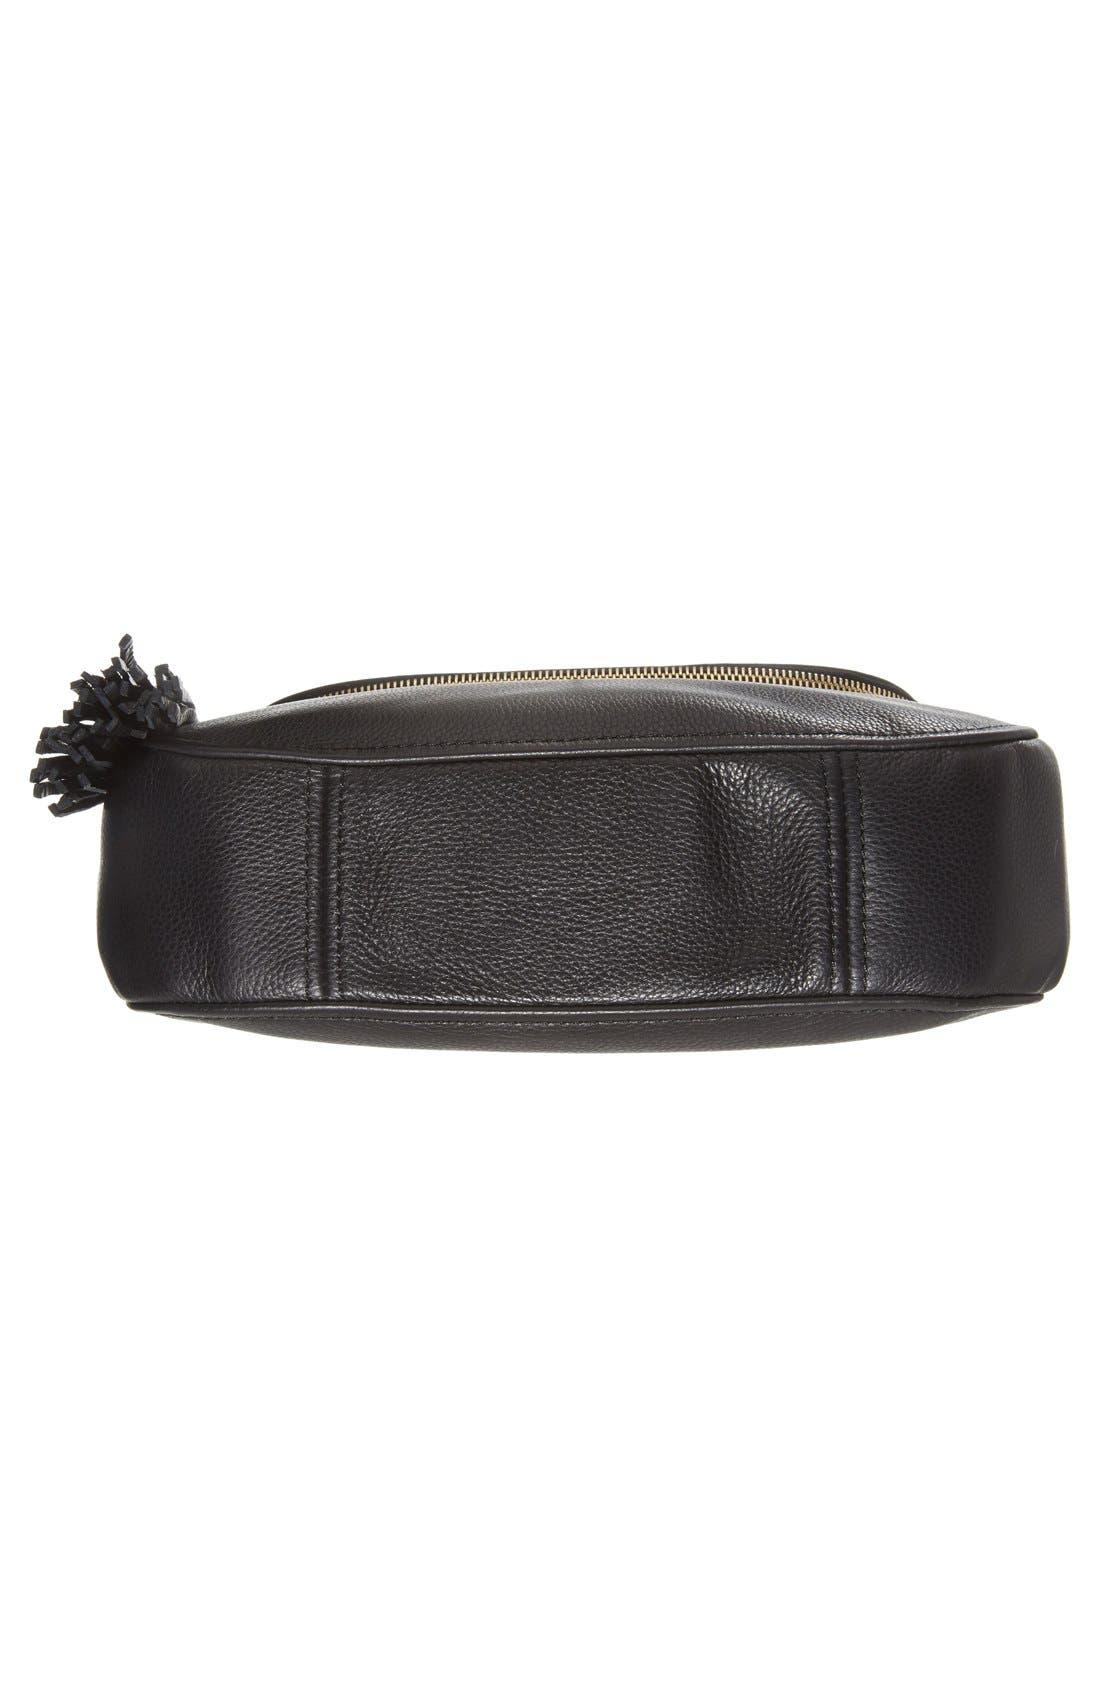 ,                             'Bedford Tassel - Medium' Convertible Leather Shoulder Bag,                             Alternate thumbnail 2, color,                             005